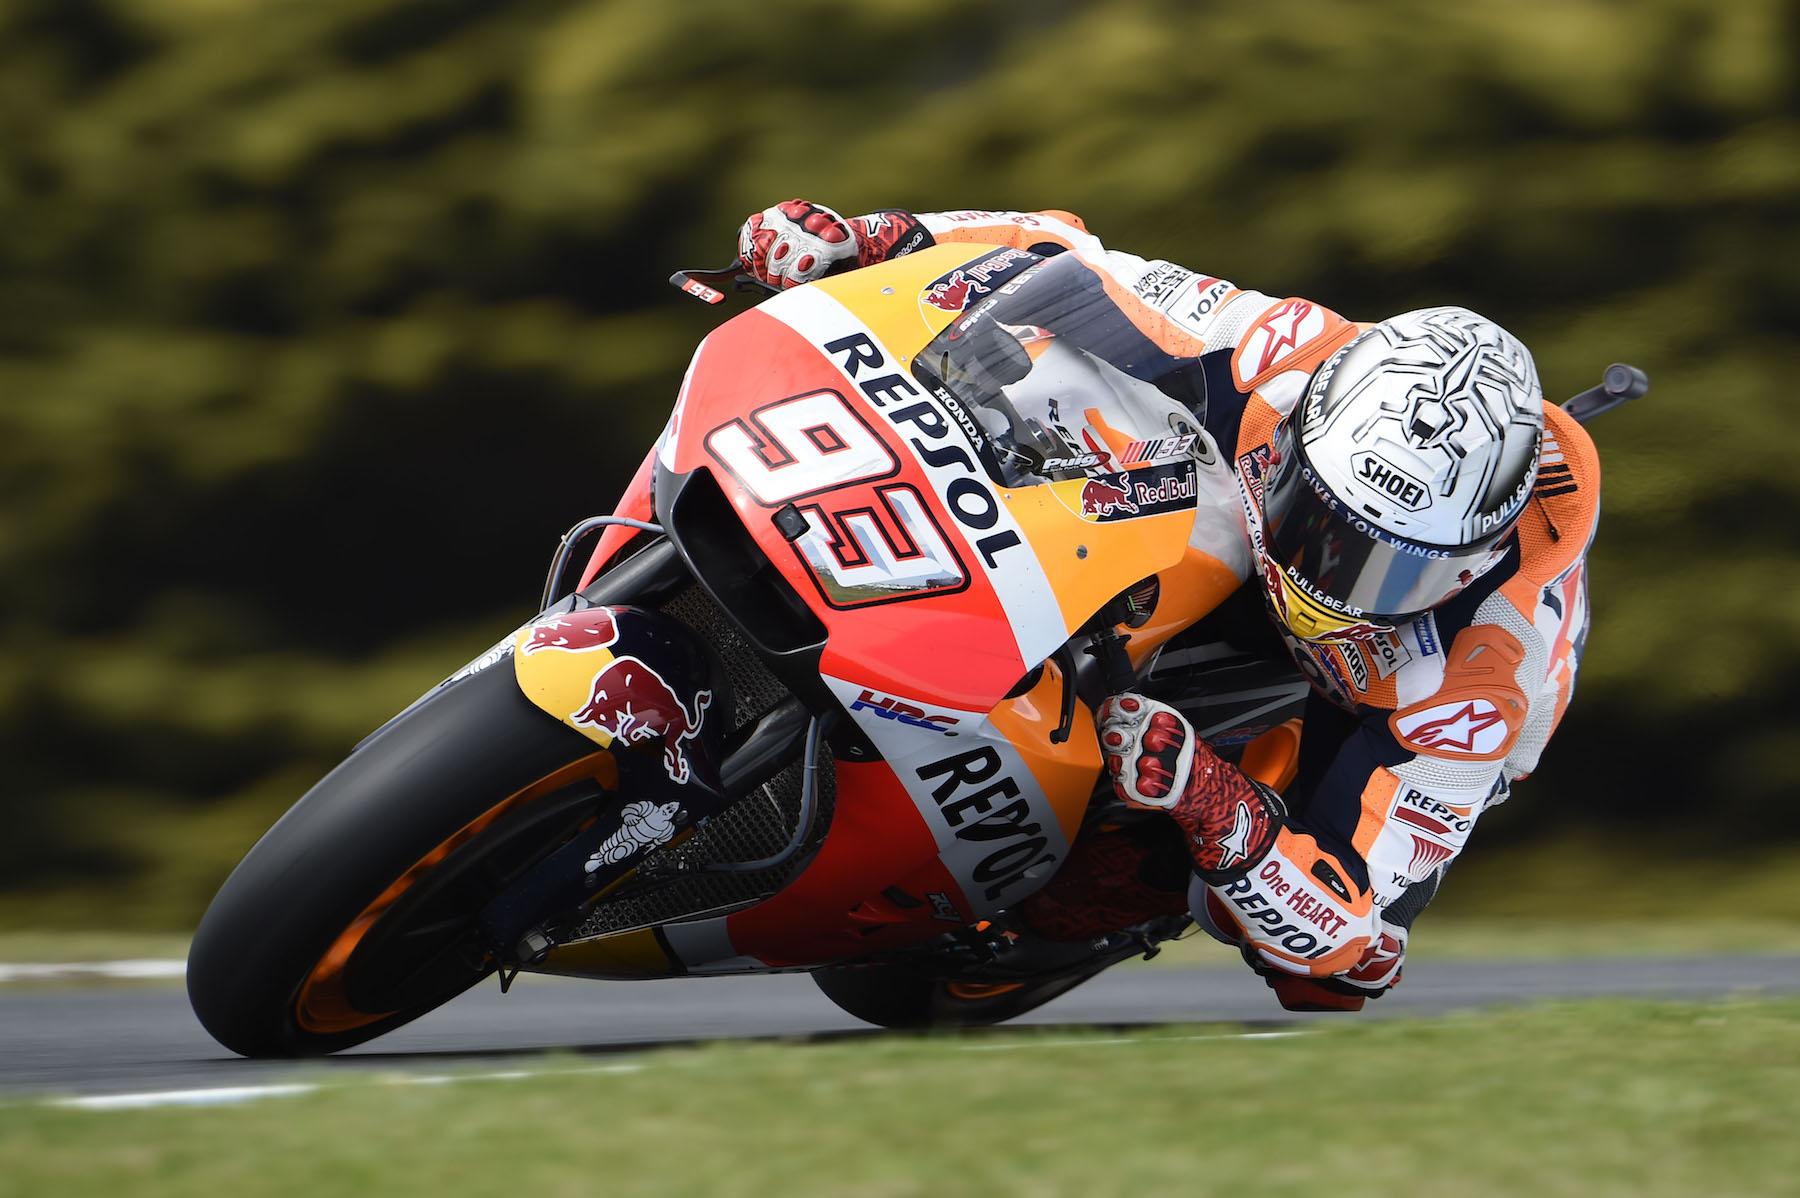 Marc Márquez toma la pole de MotoGP en Australia con Andrea Dovizioso undécimo